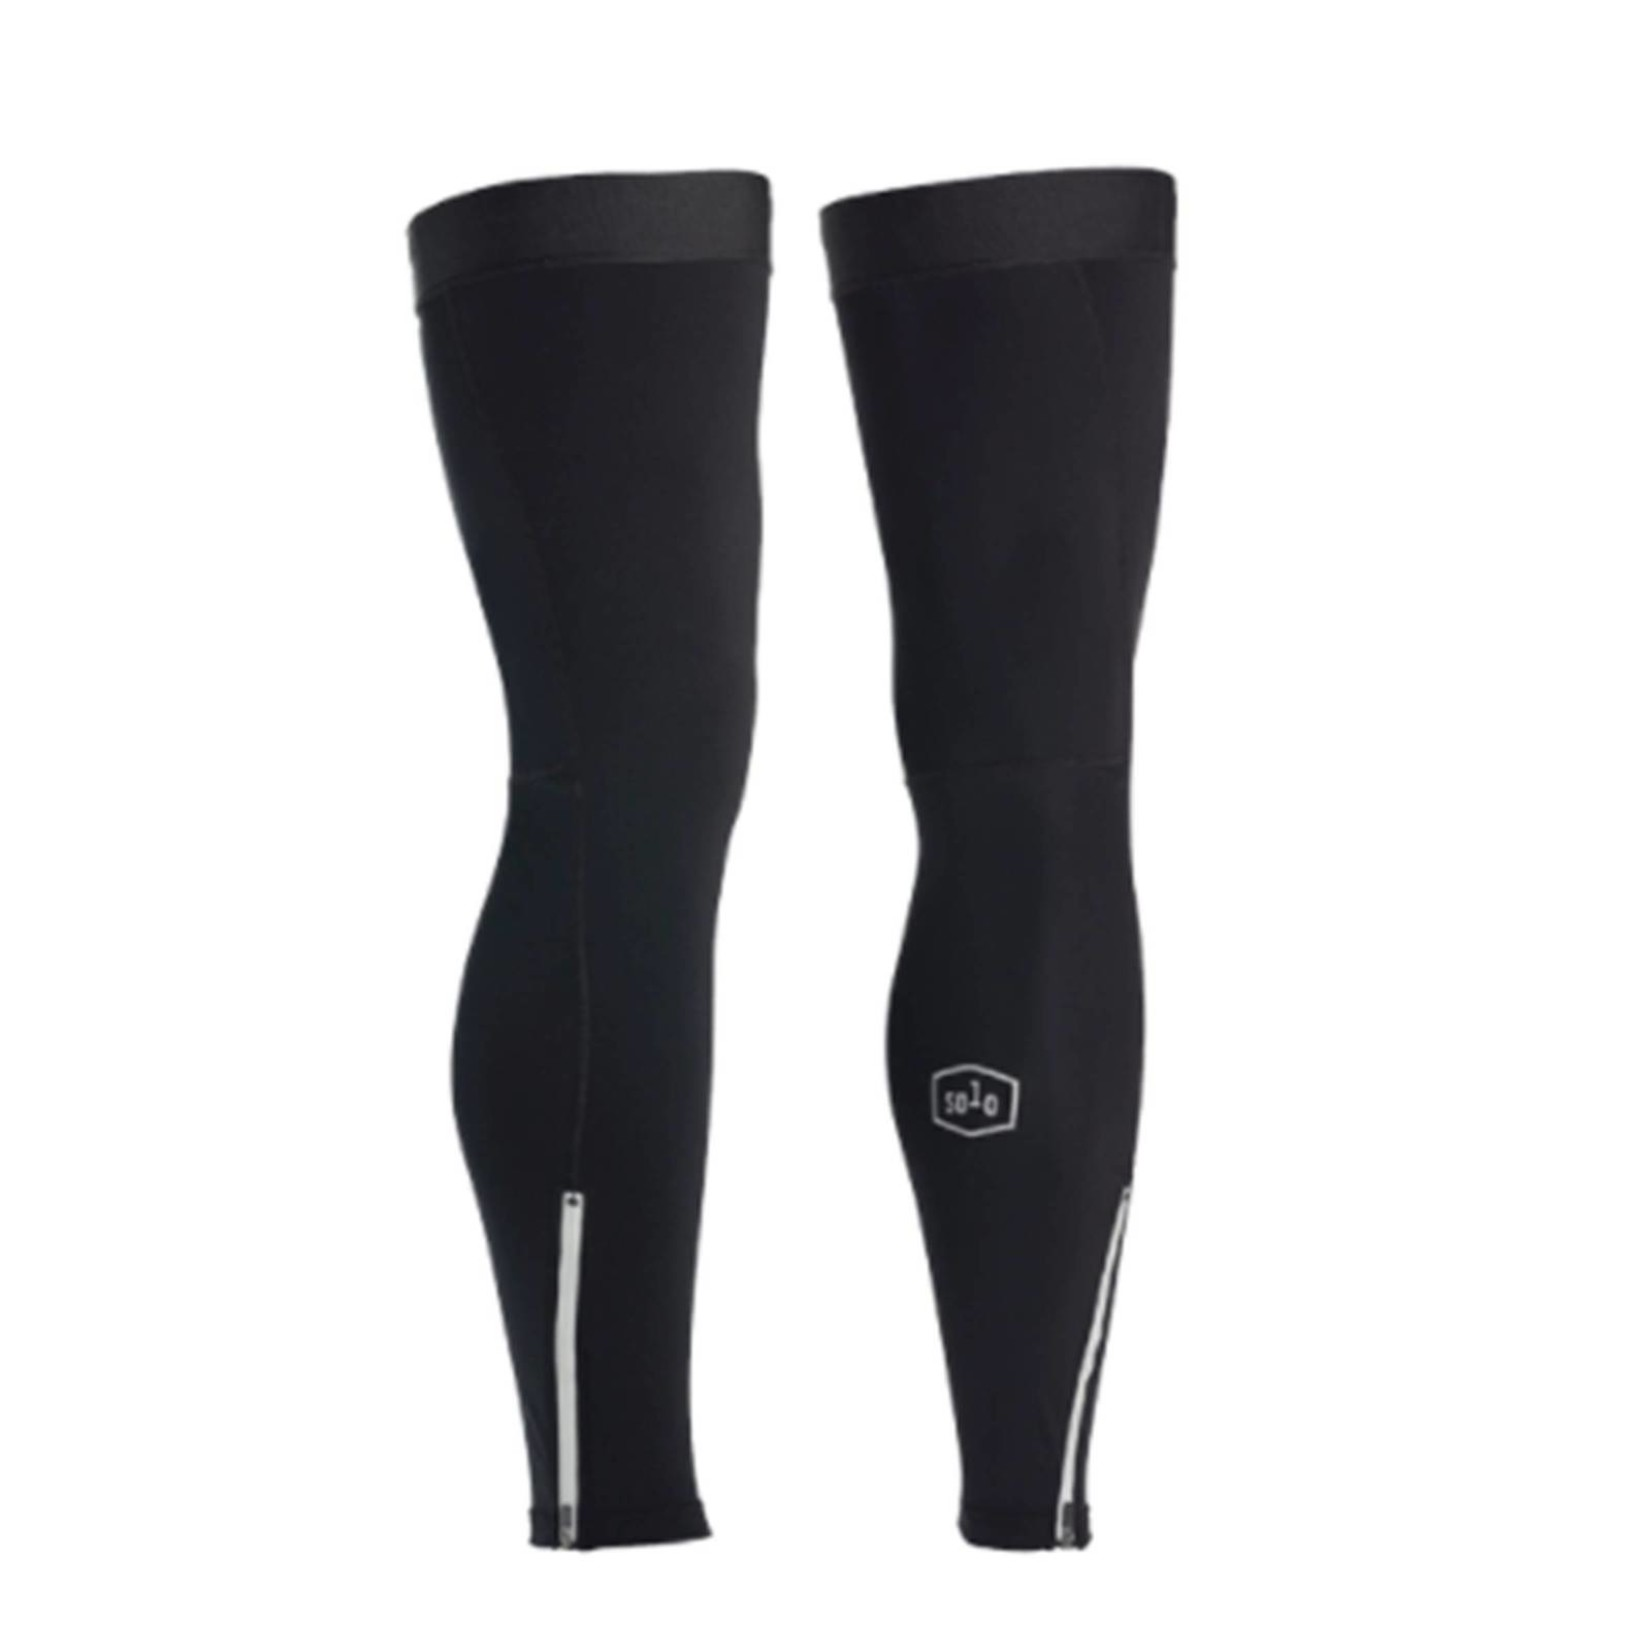 SOLO Solo Leg Warmers